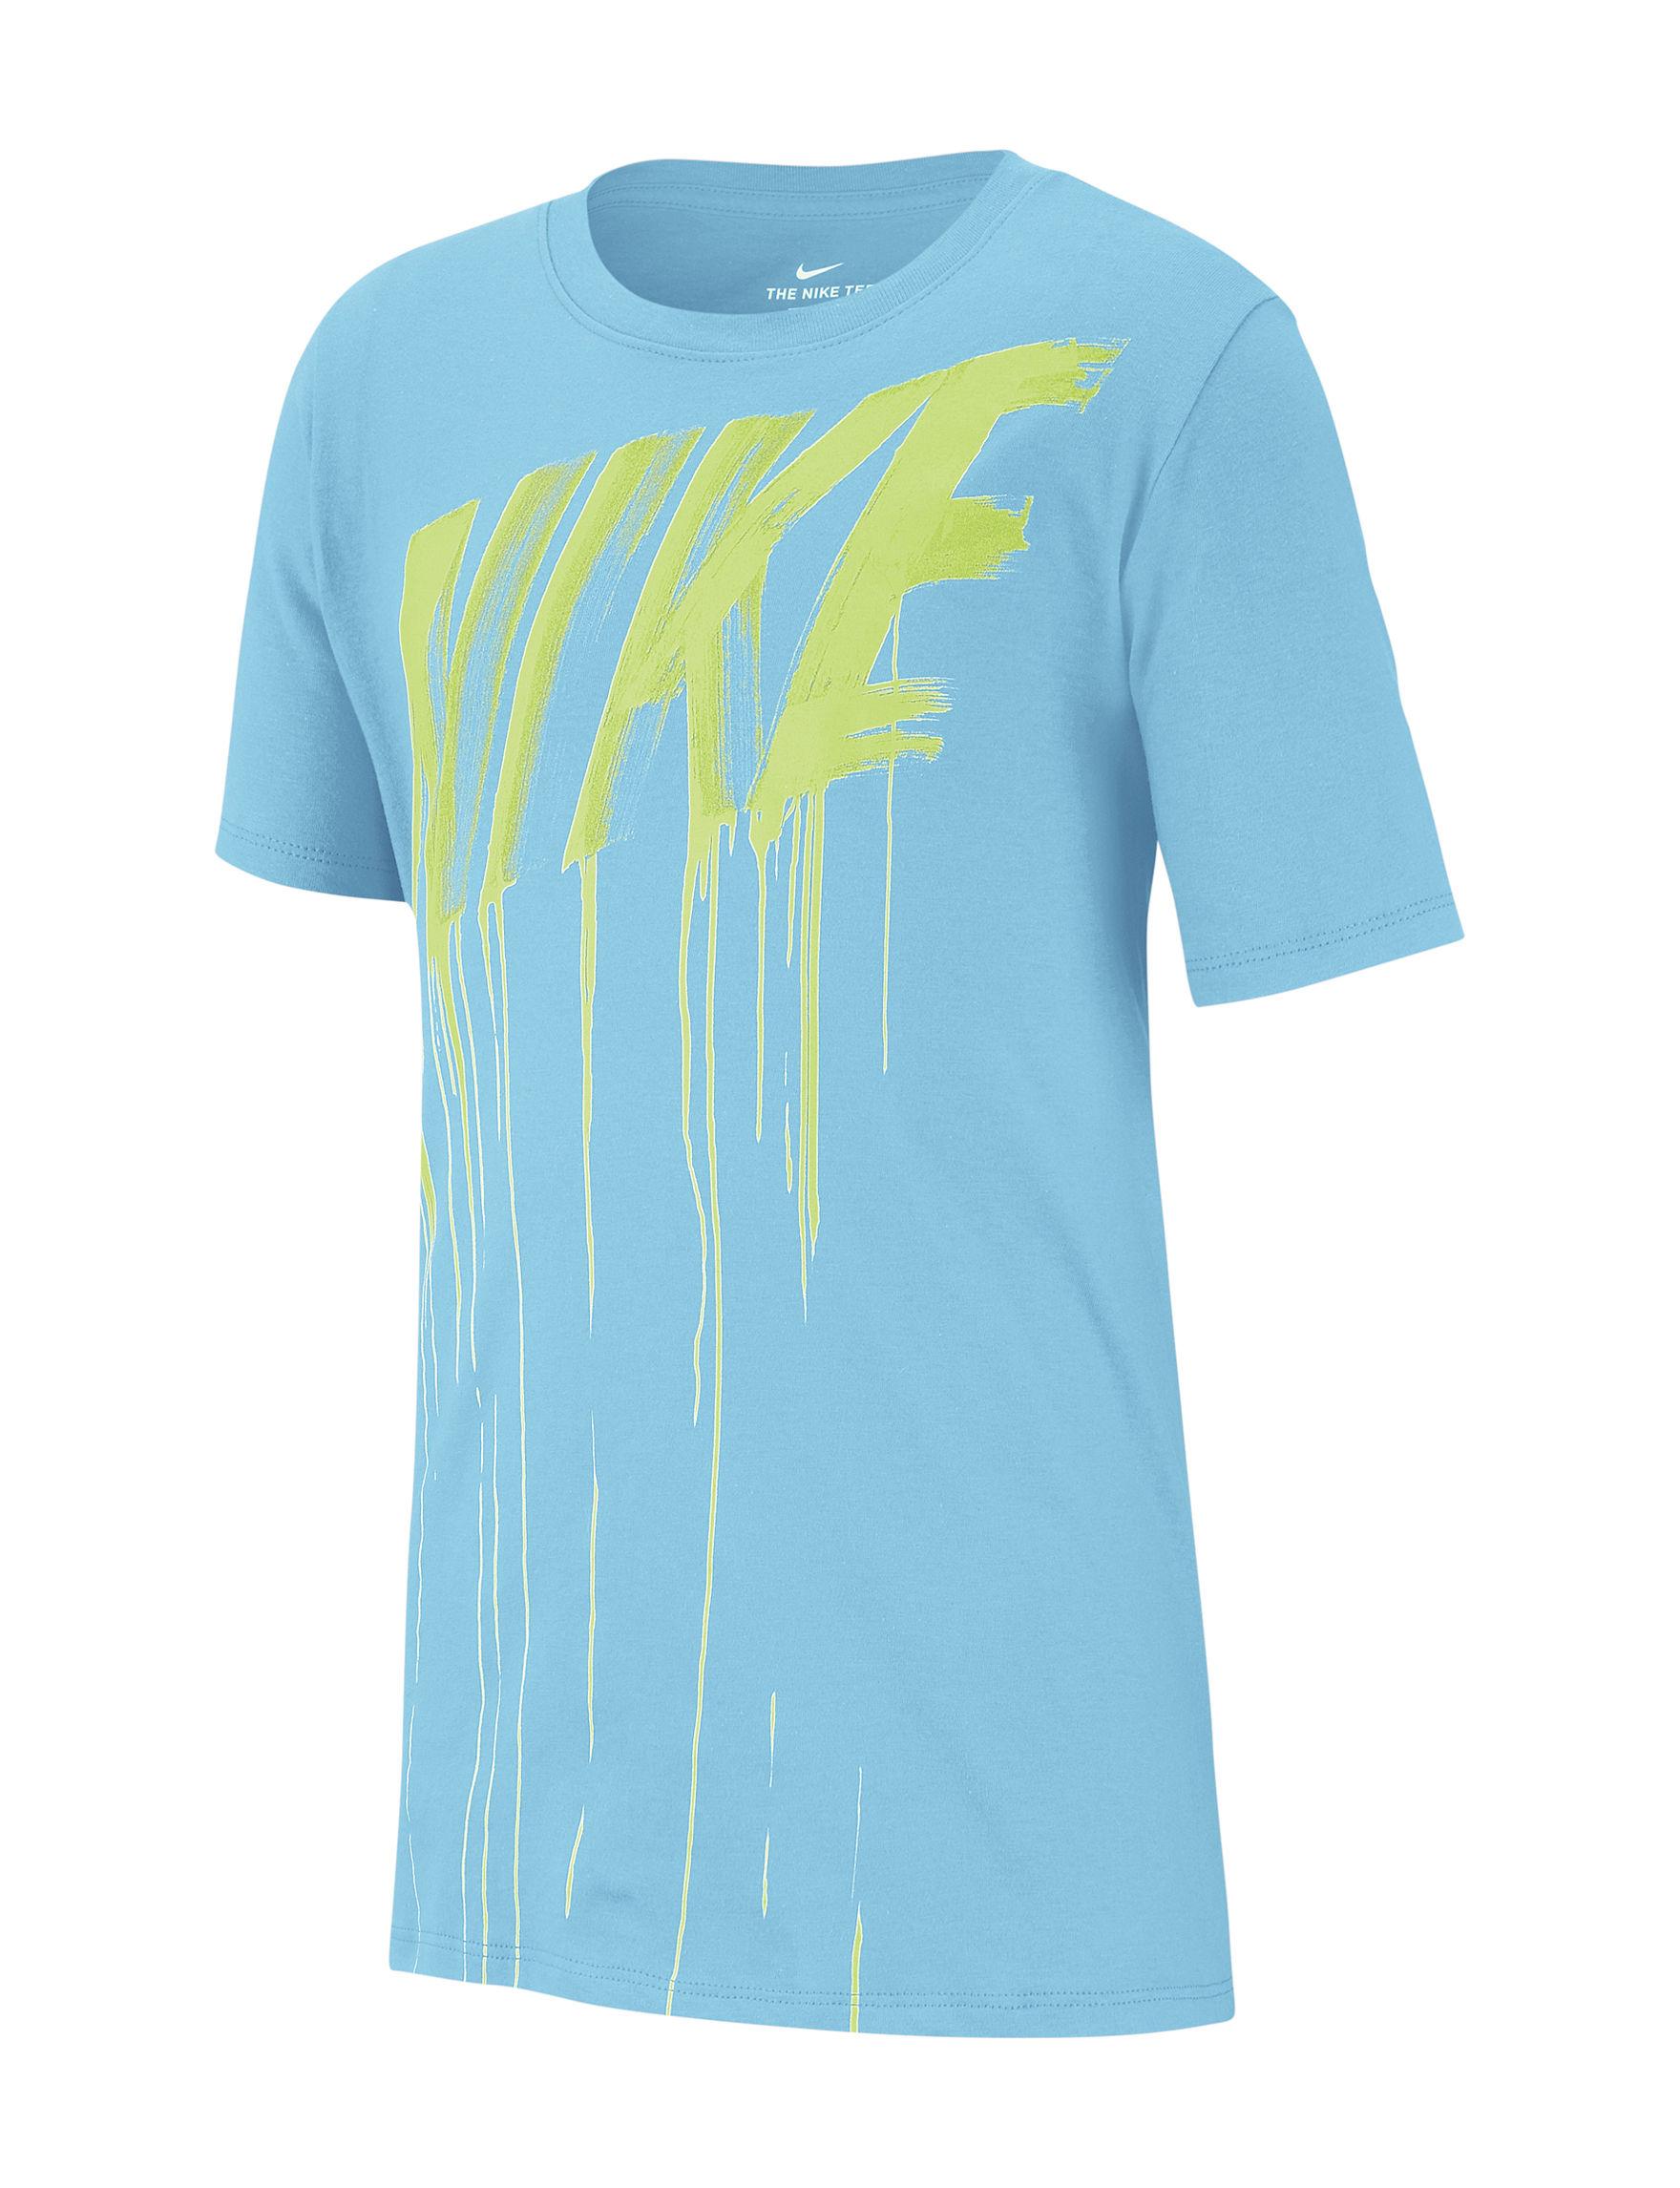 Nike Light Blue Tees & Tanks